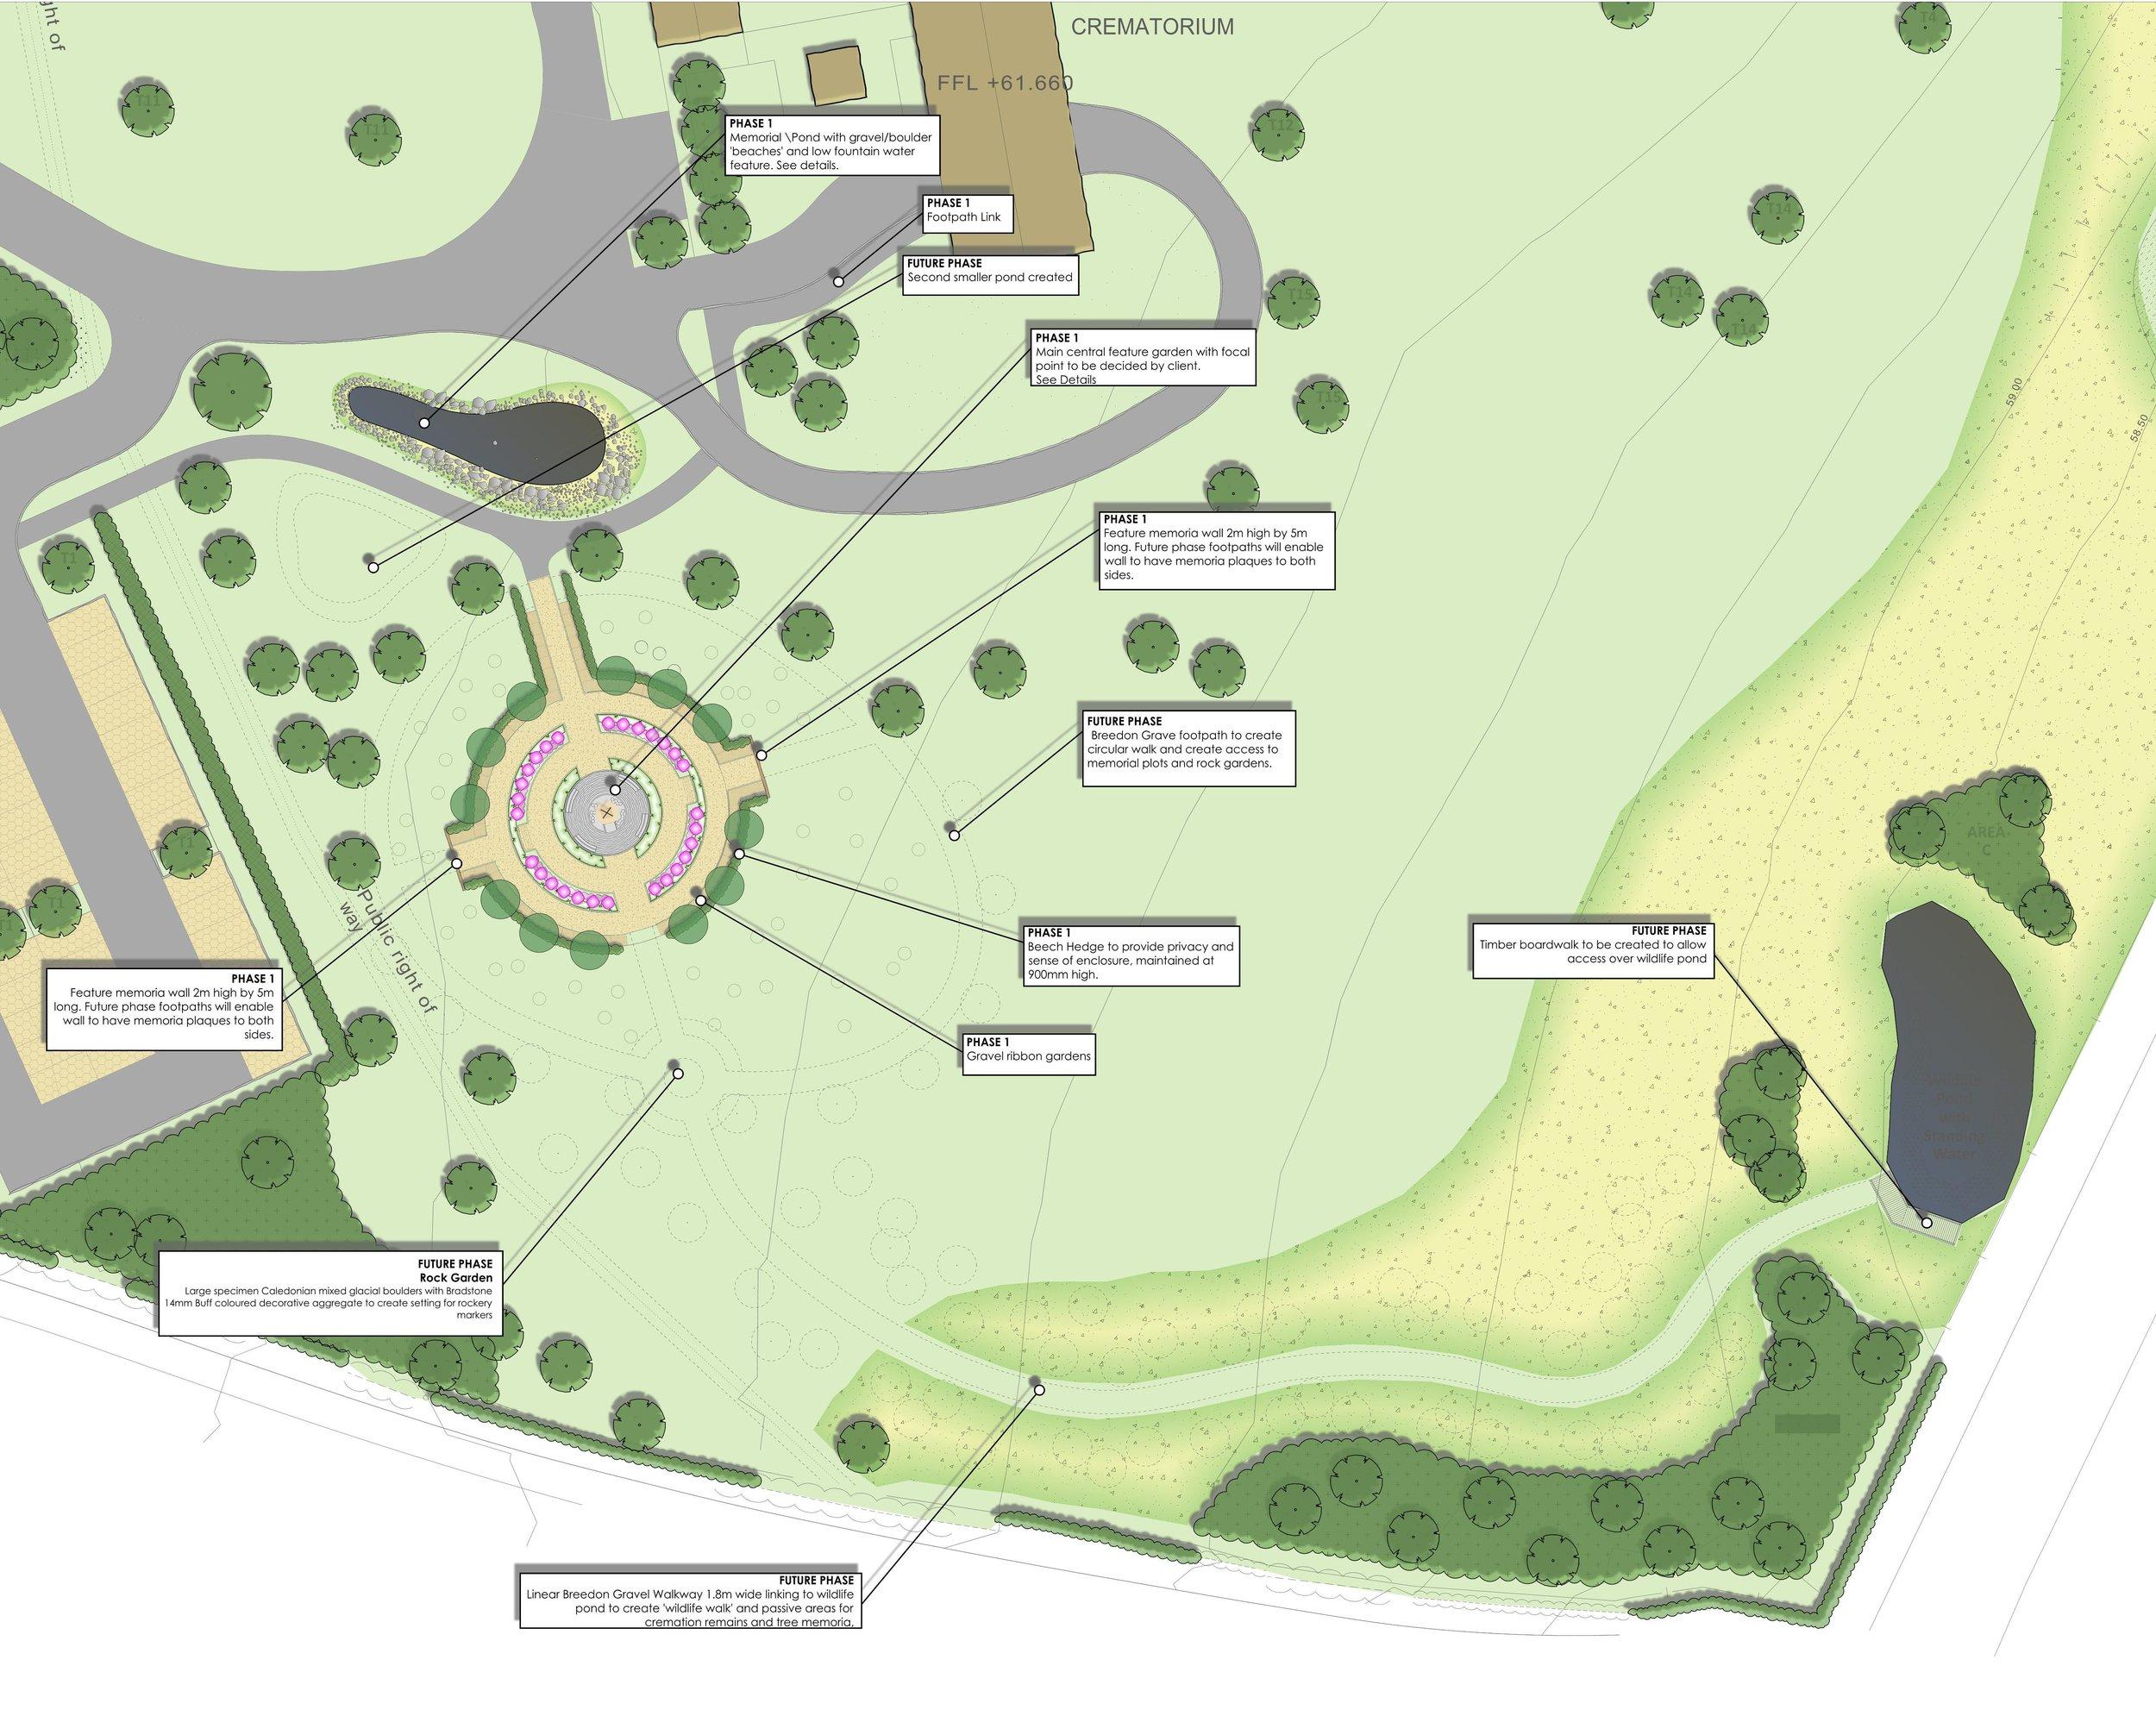 010.895.003 Fradley Crematorium Memorial Gardens_Page_1.jpeg